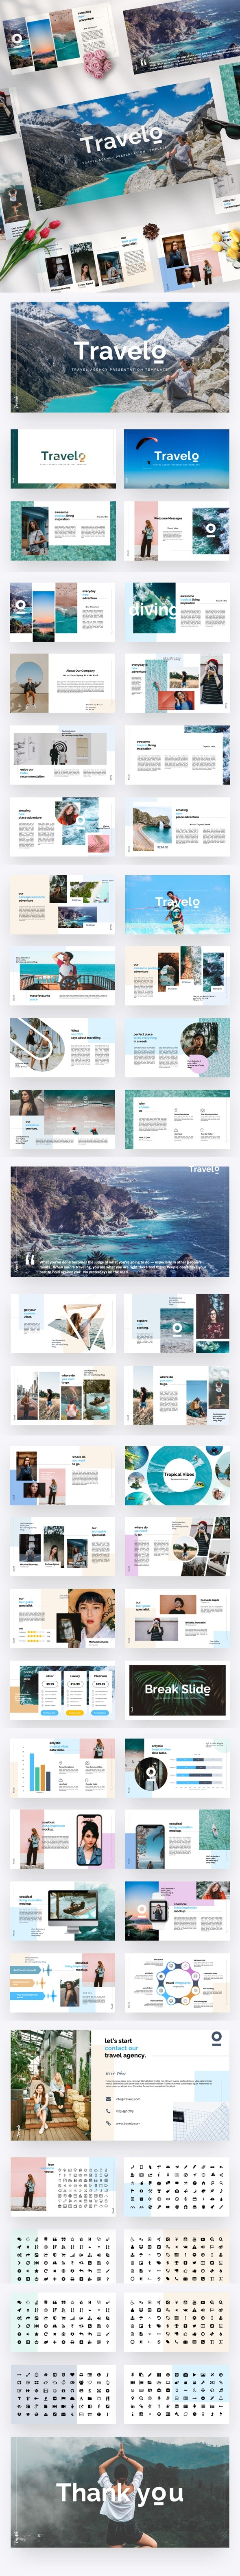 Travelo - Travel Agency Keynote Template - Business Keynote Templates